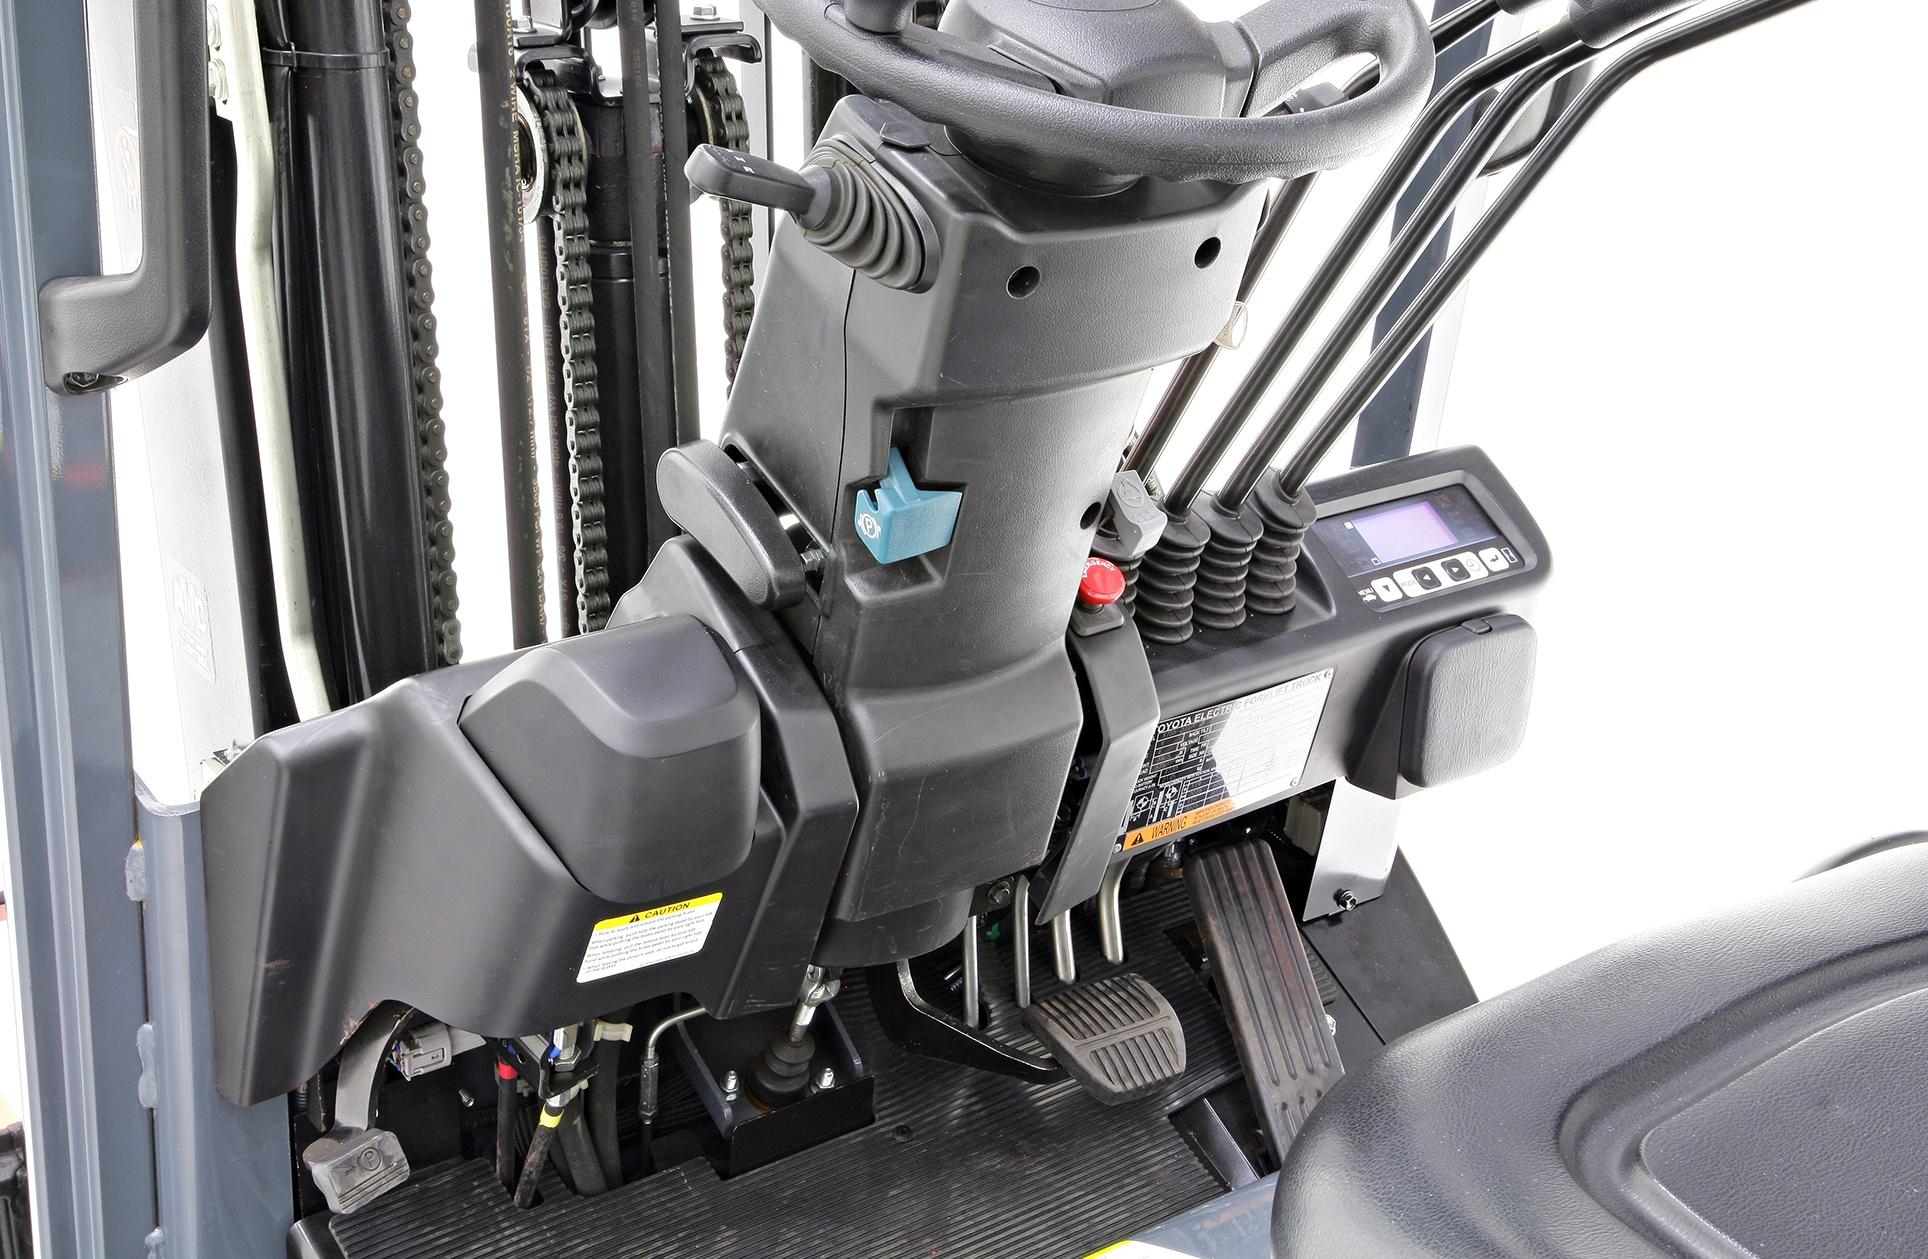 electric_3-wheel_durability.jpg